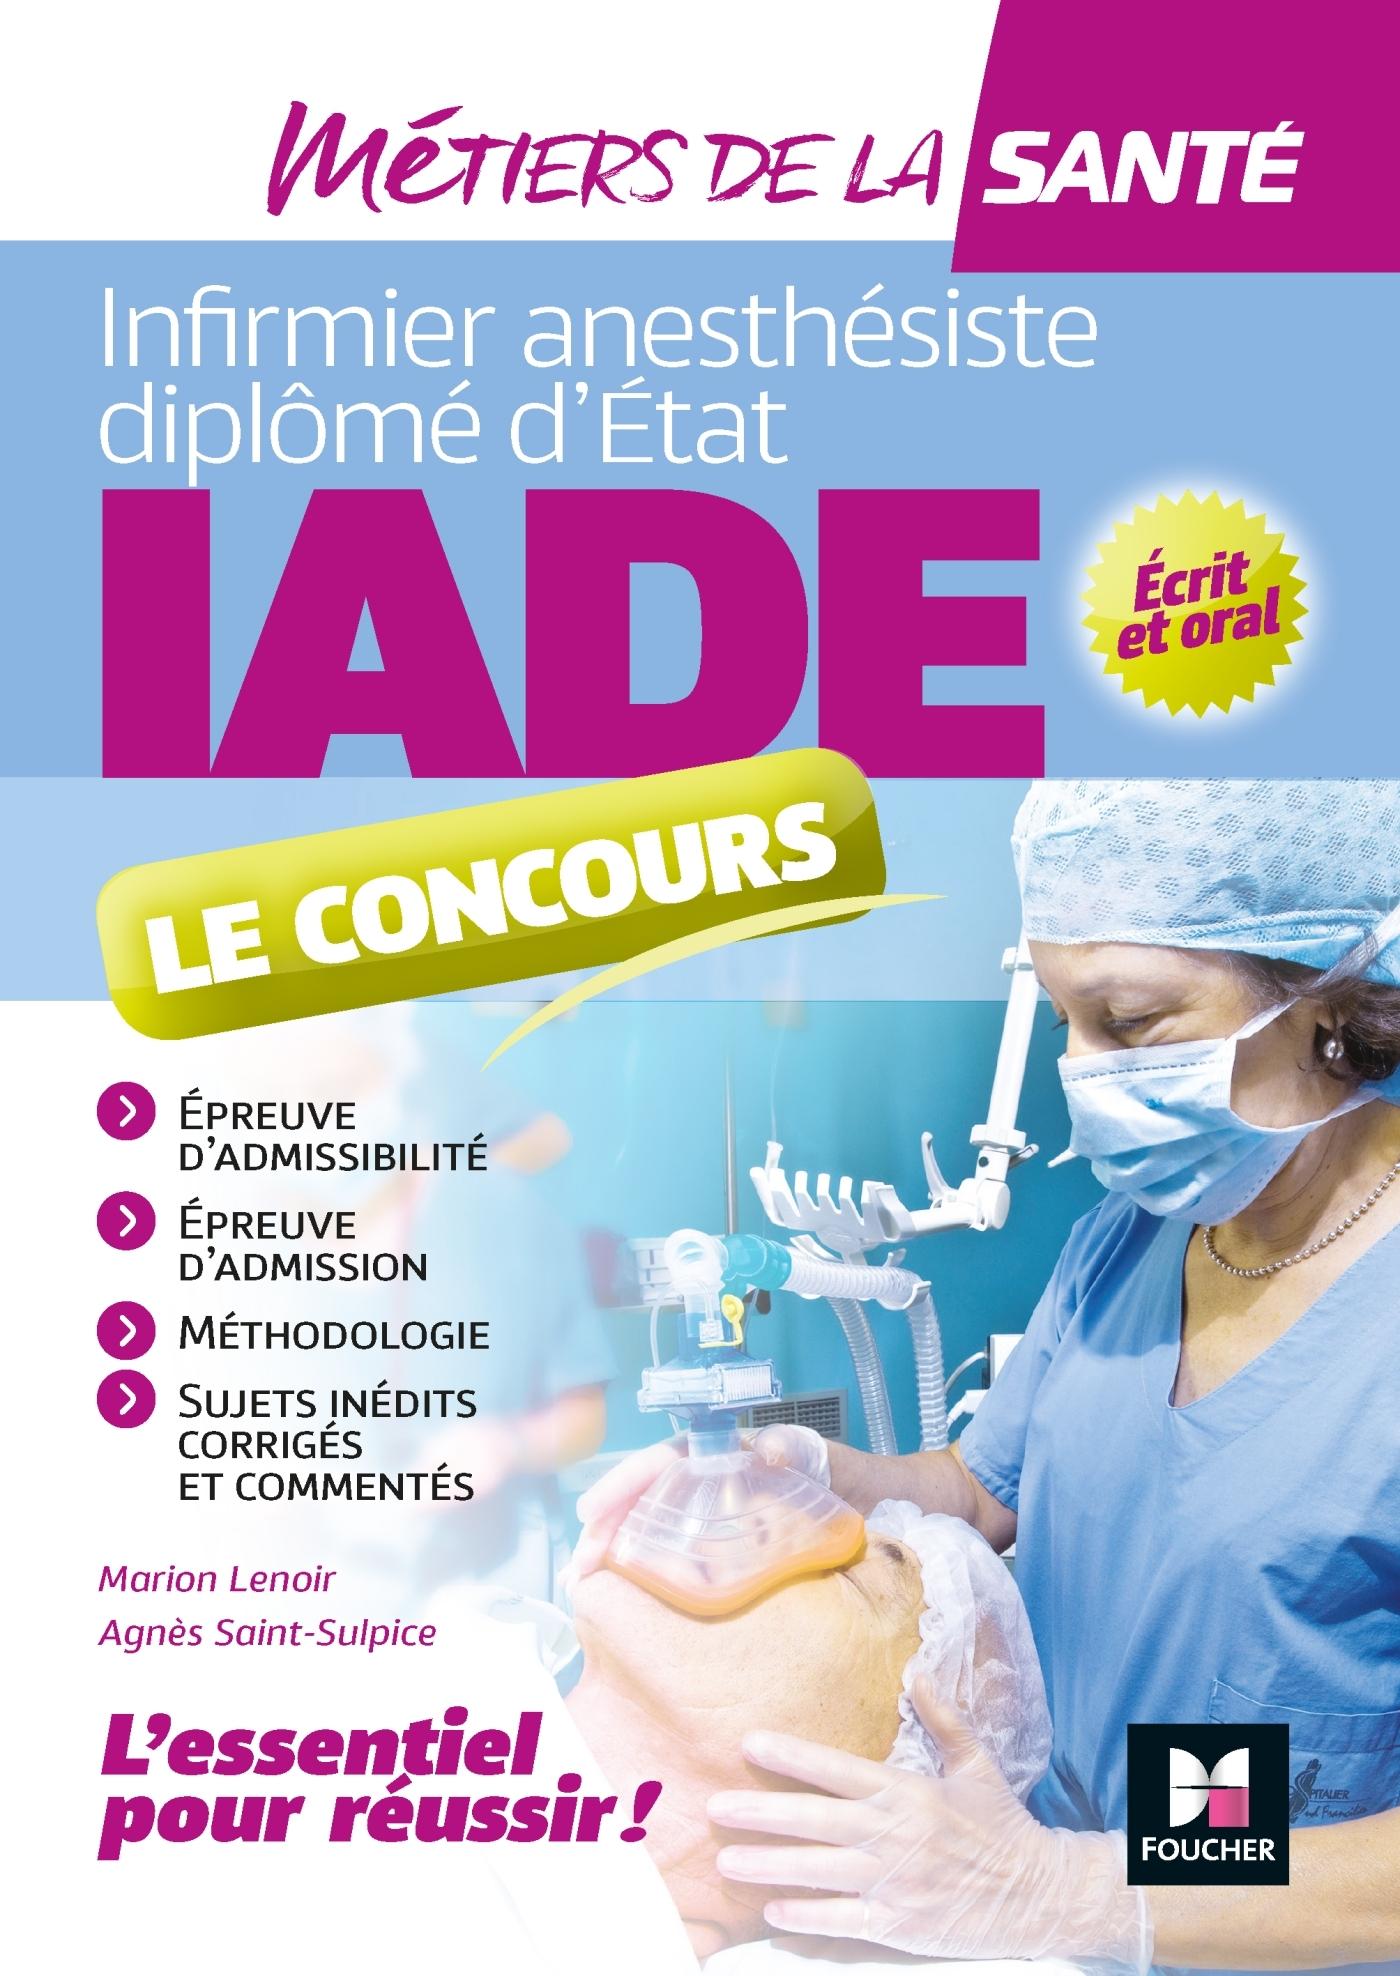 METIERS DE LA SANTE - IADE- REUSSIR LE CONCOURS D'ENTREE - PREPARATION COMPLETE